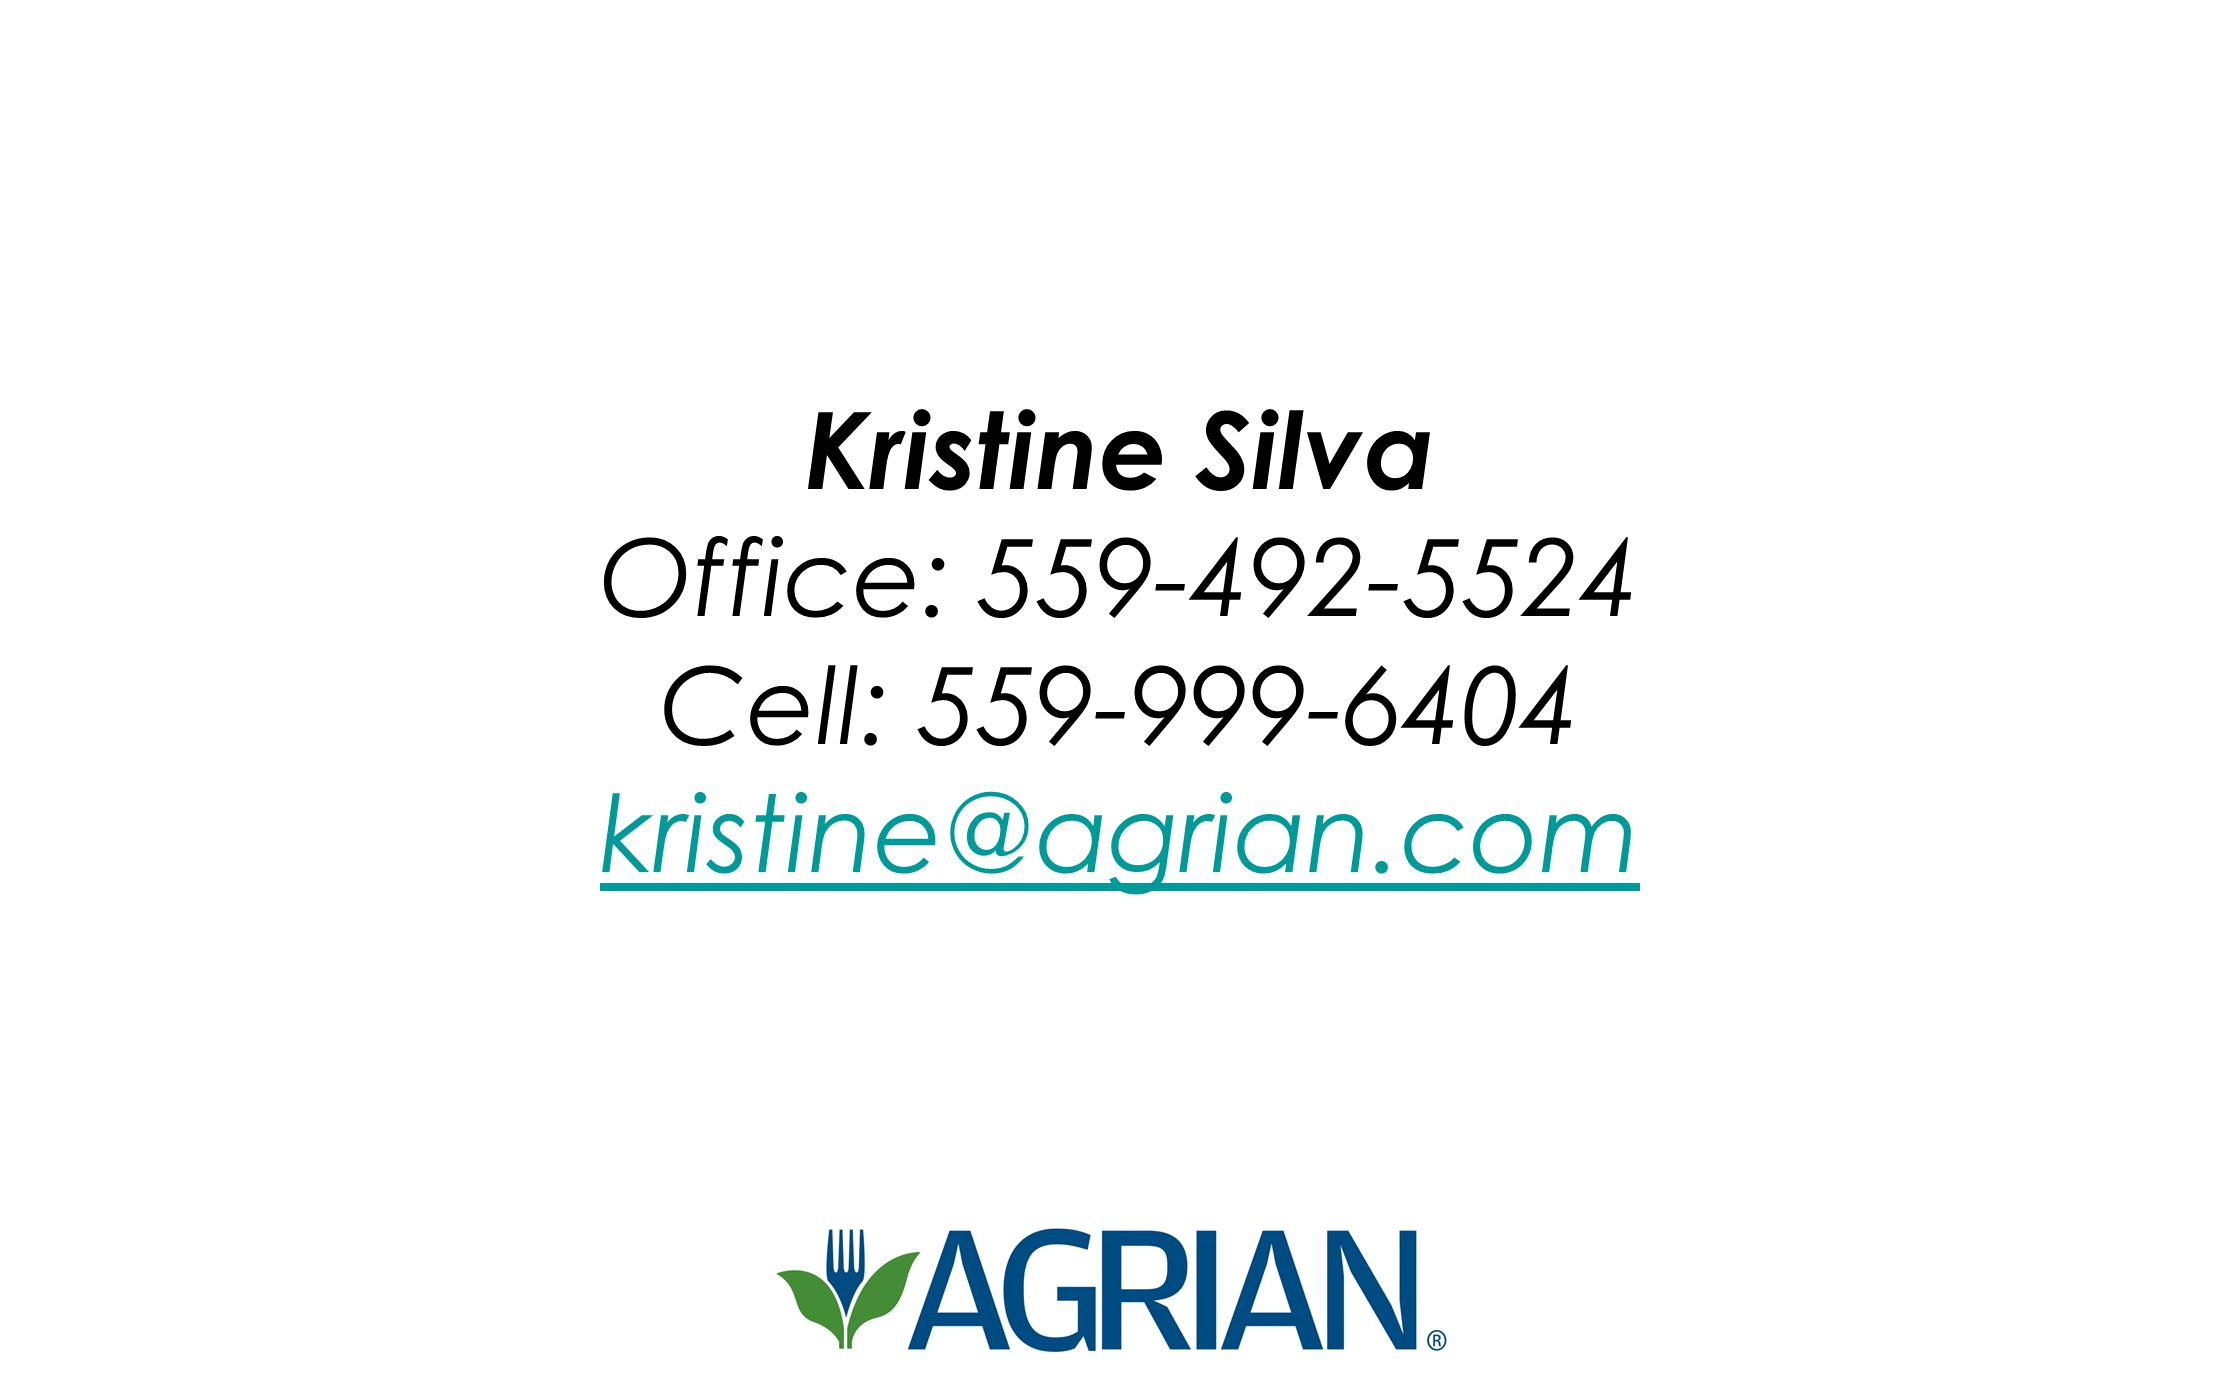 Kristine Silva Office: 559-492-5524 Cell: 559-999-6404 kristine@agrian.com